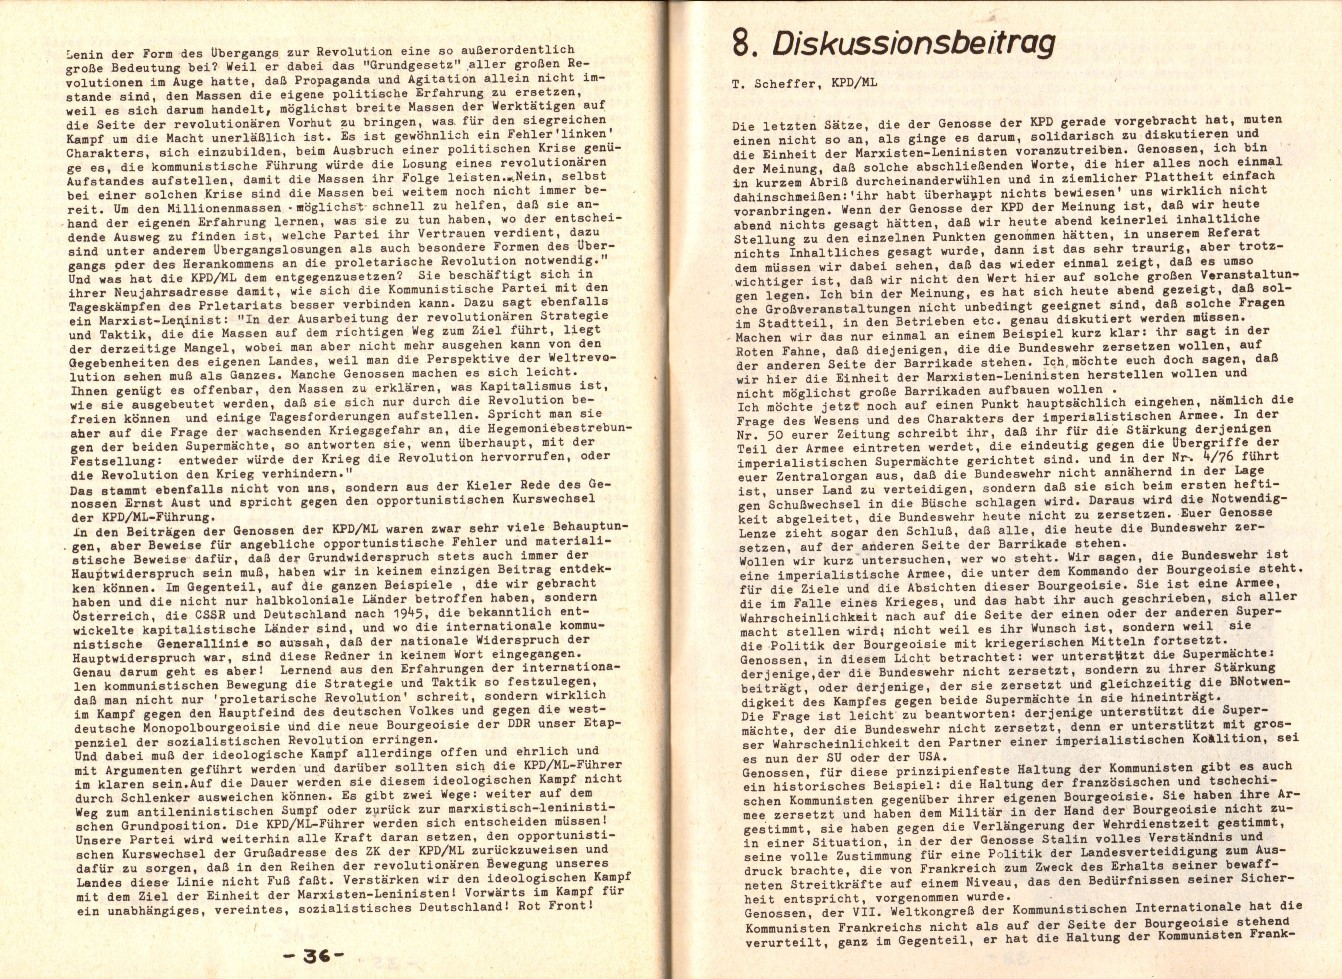 Berlin_AO_1976_Veranstaltung_mit_KPDML_19